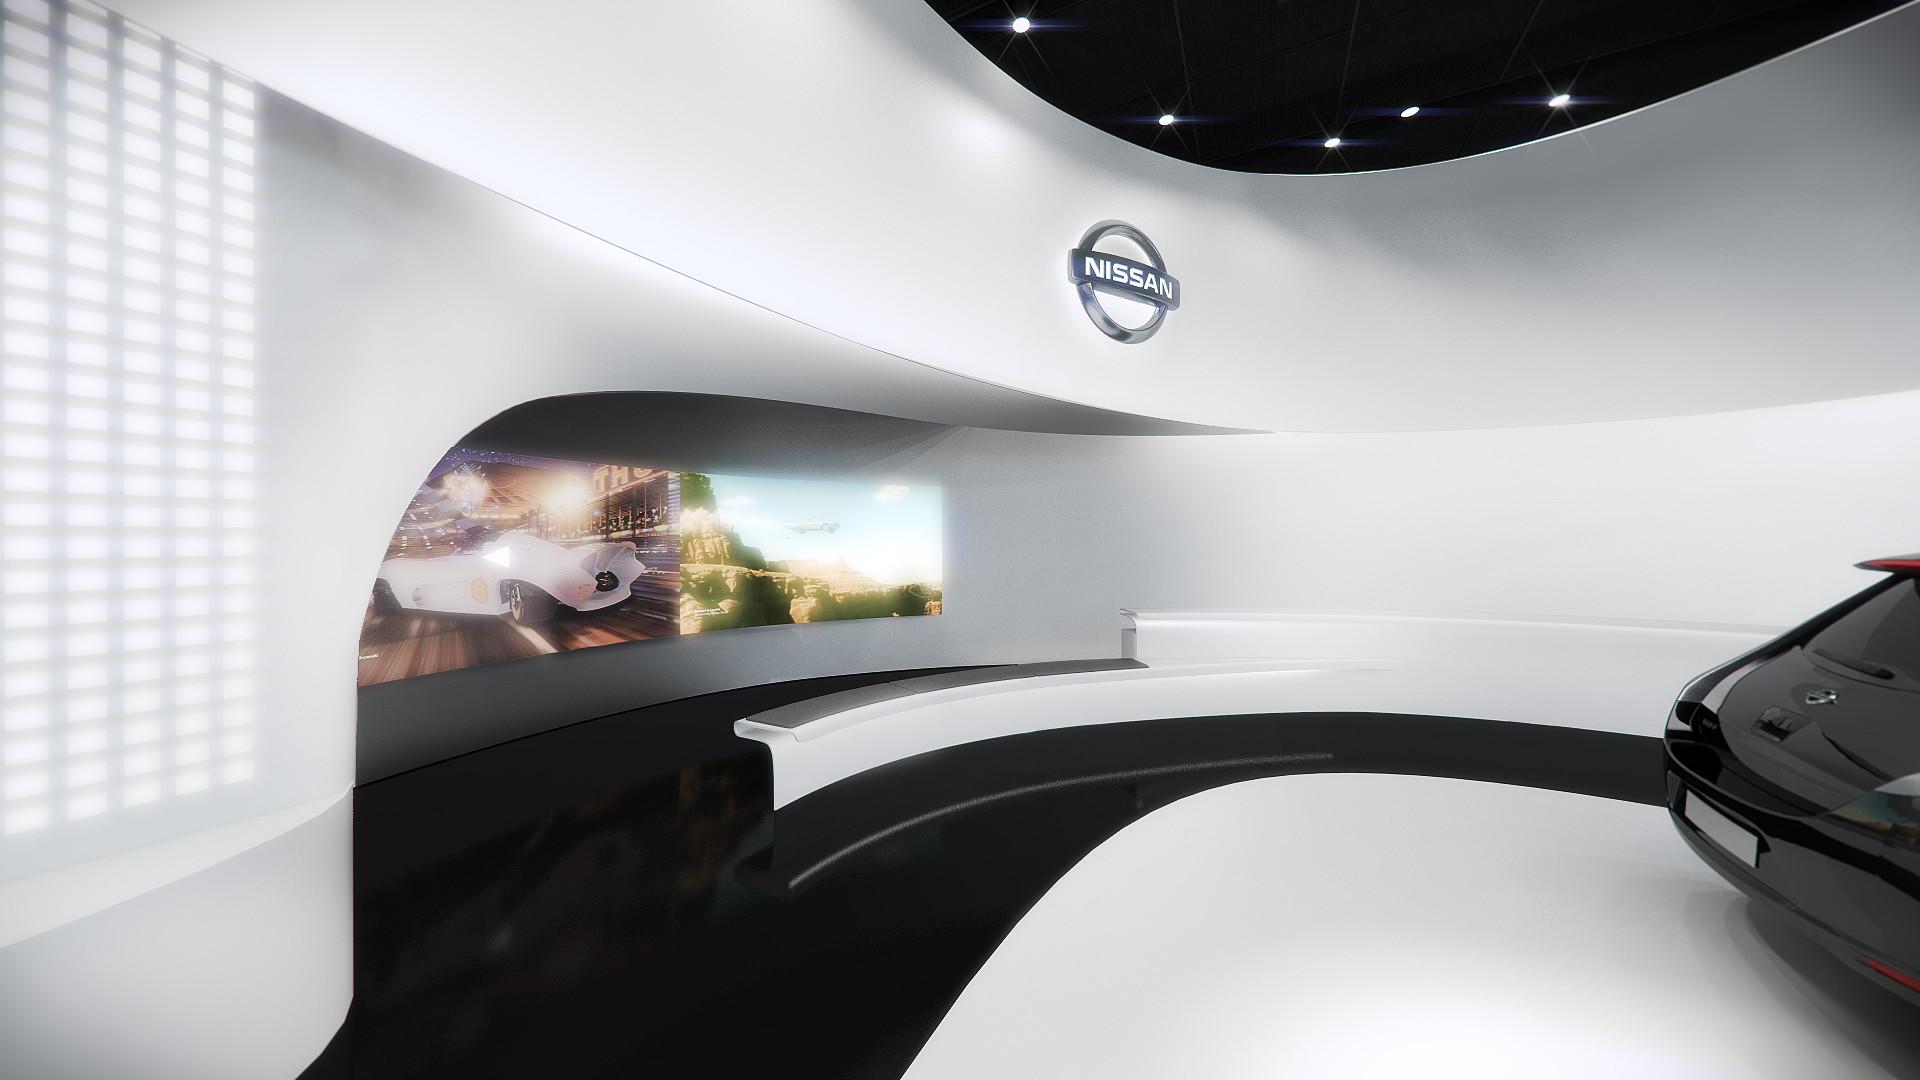 15_1026_Nissan_GF-theater.jpg